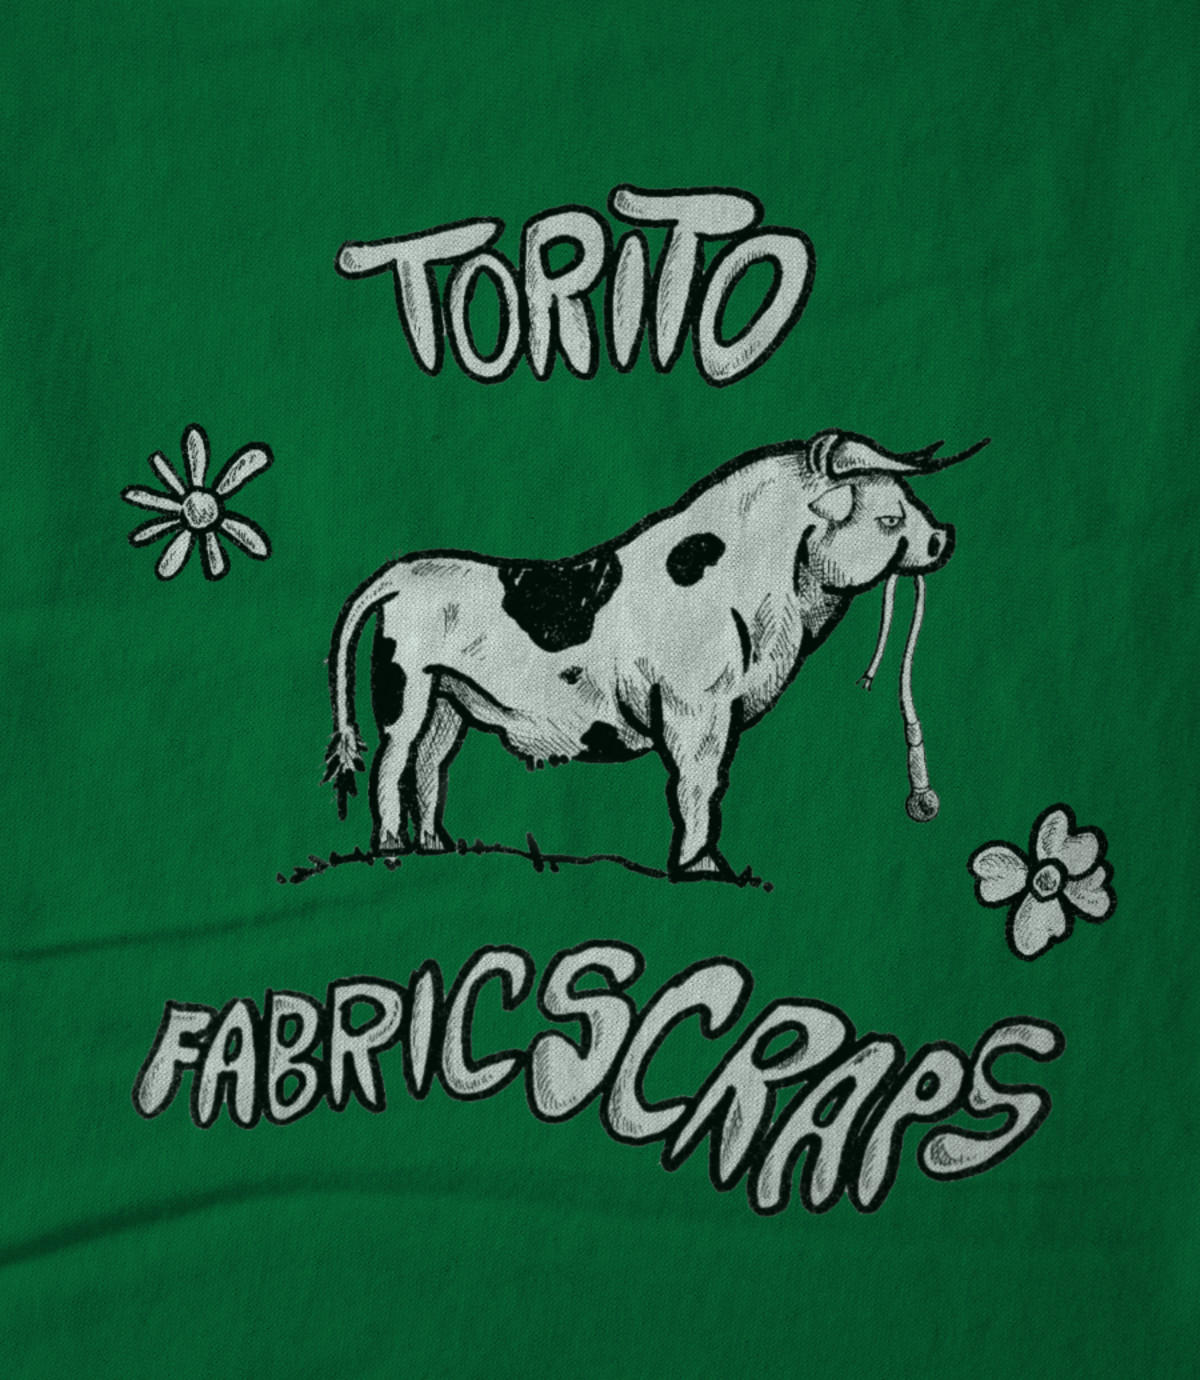 U don t deserve this beautiful art torito fabric scraps 1514755975